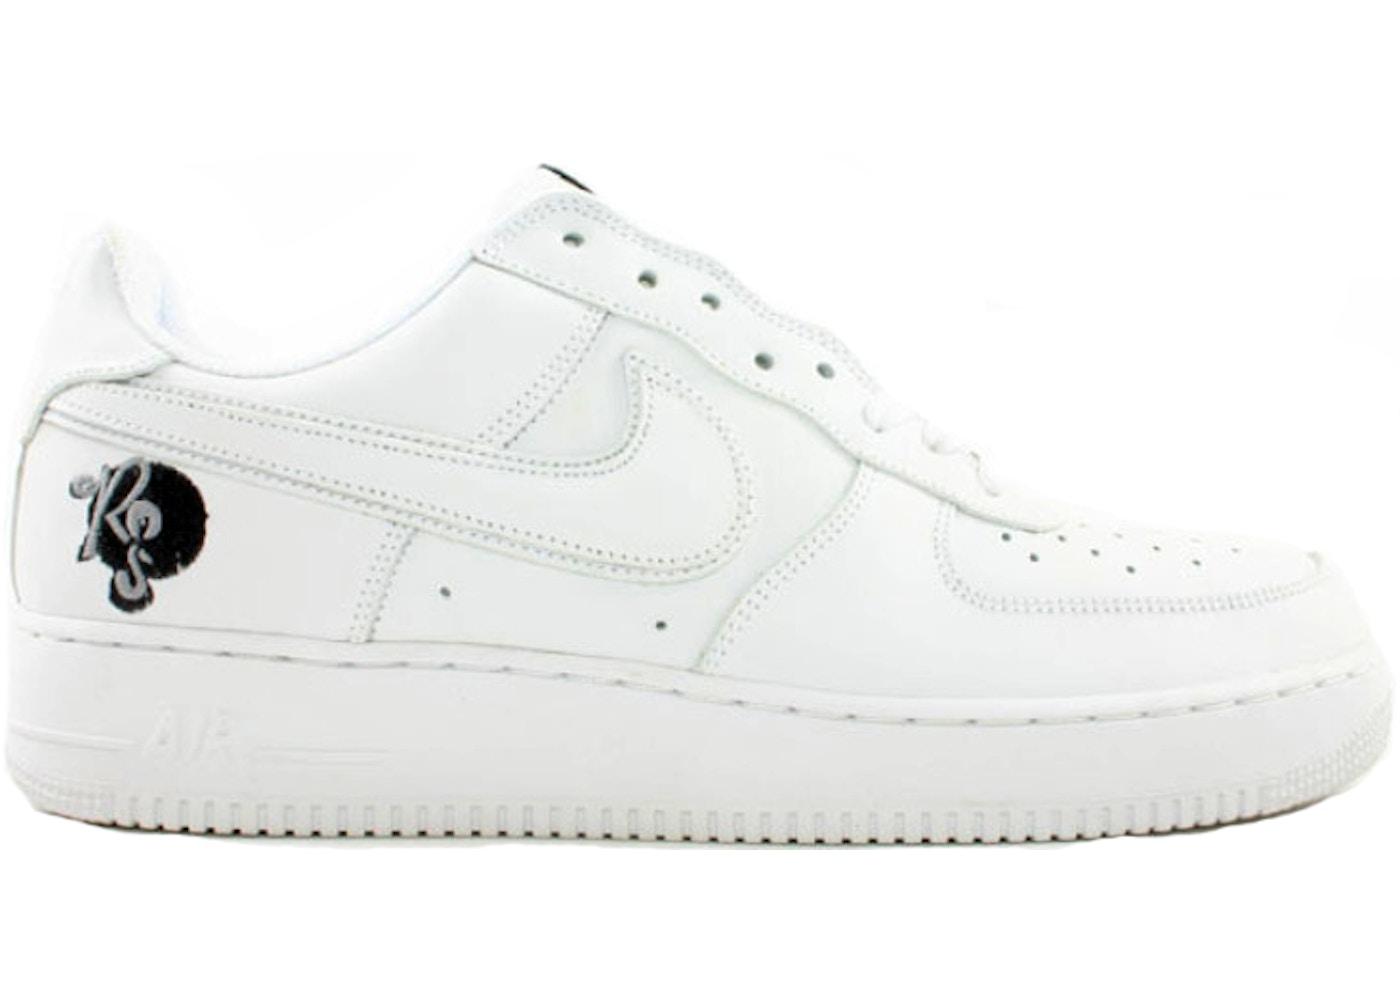 Nike Air Force 1 Low Rocafella